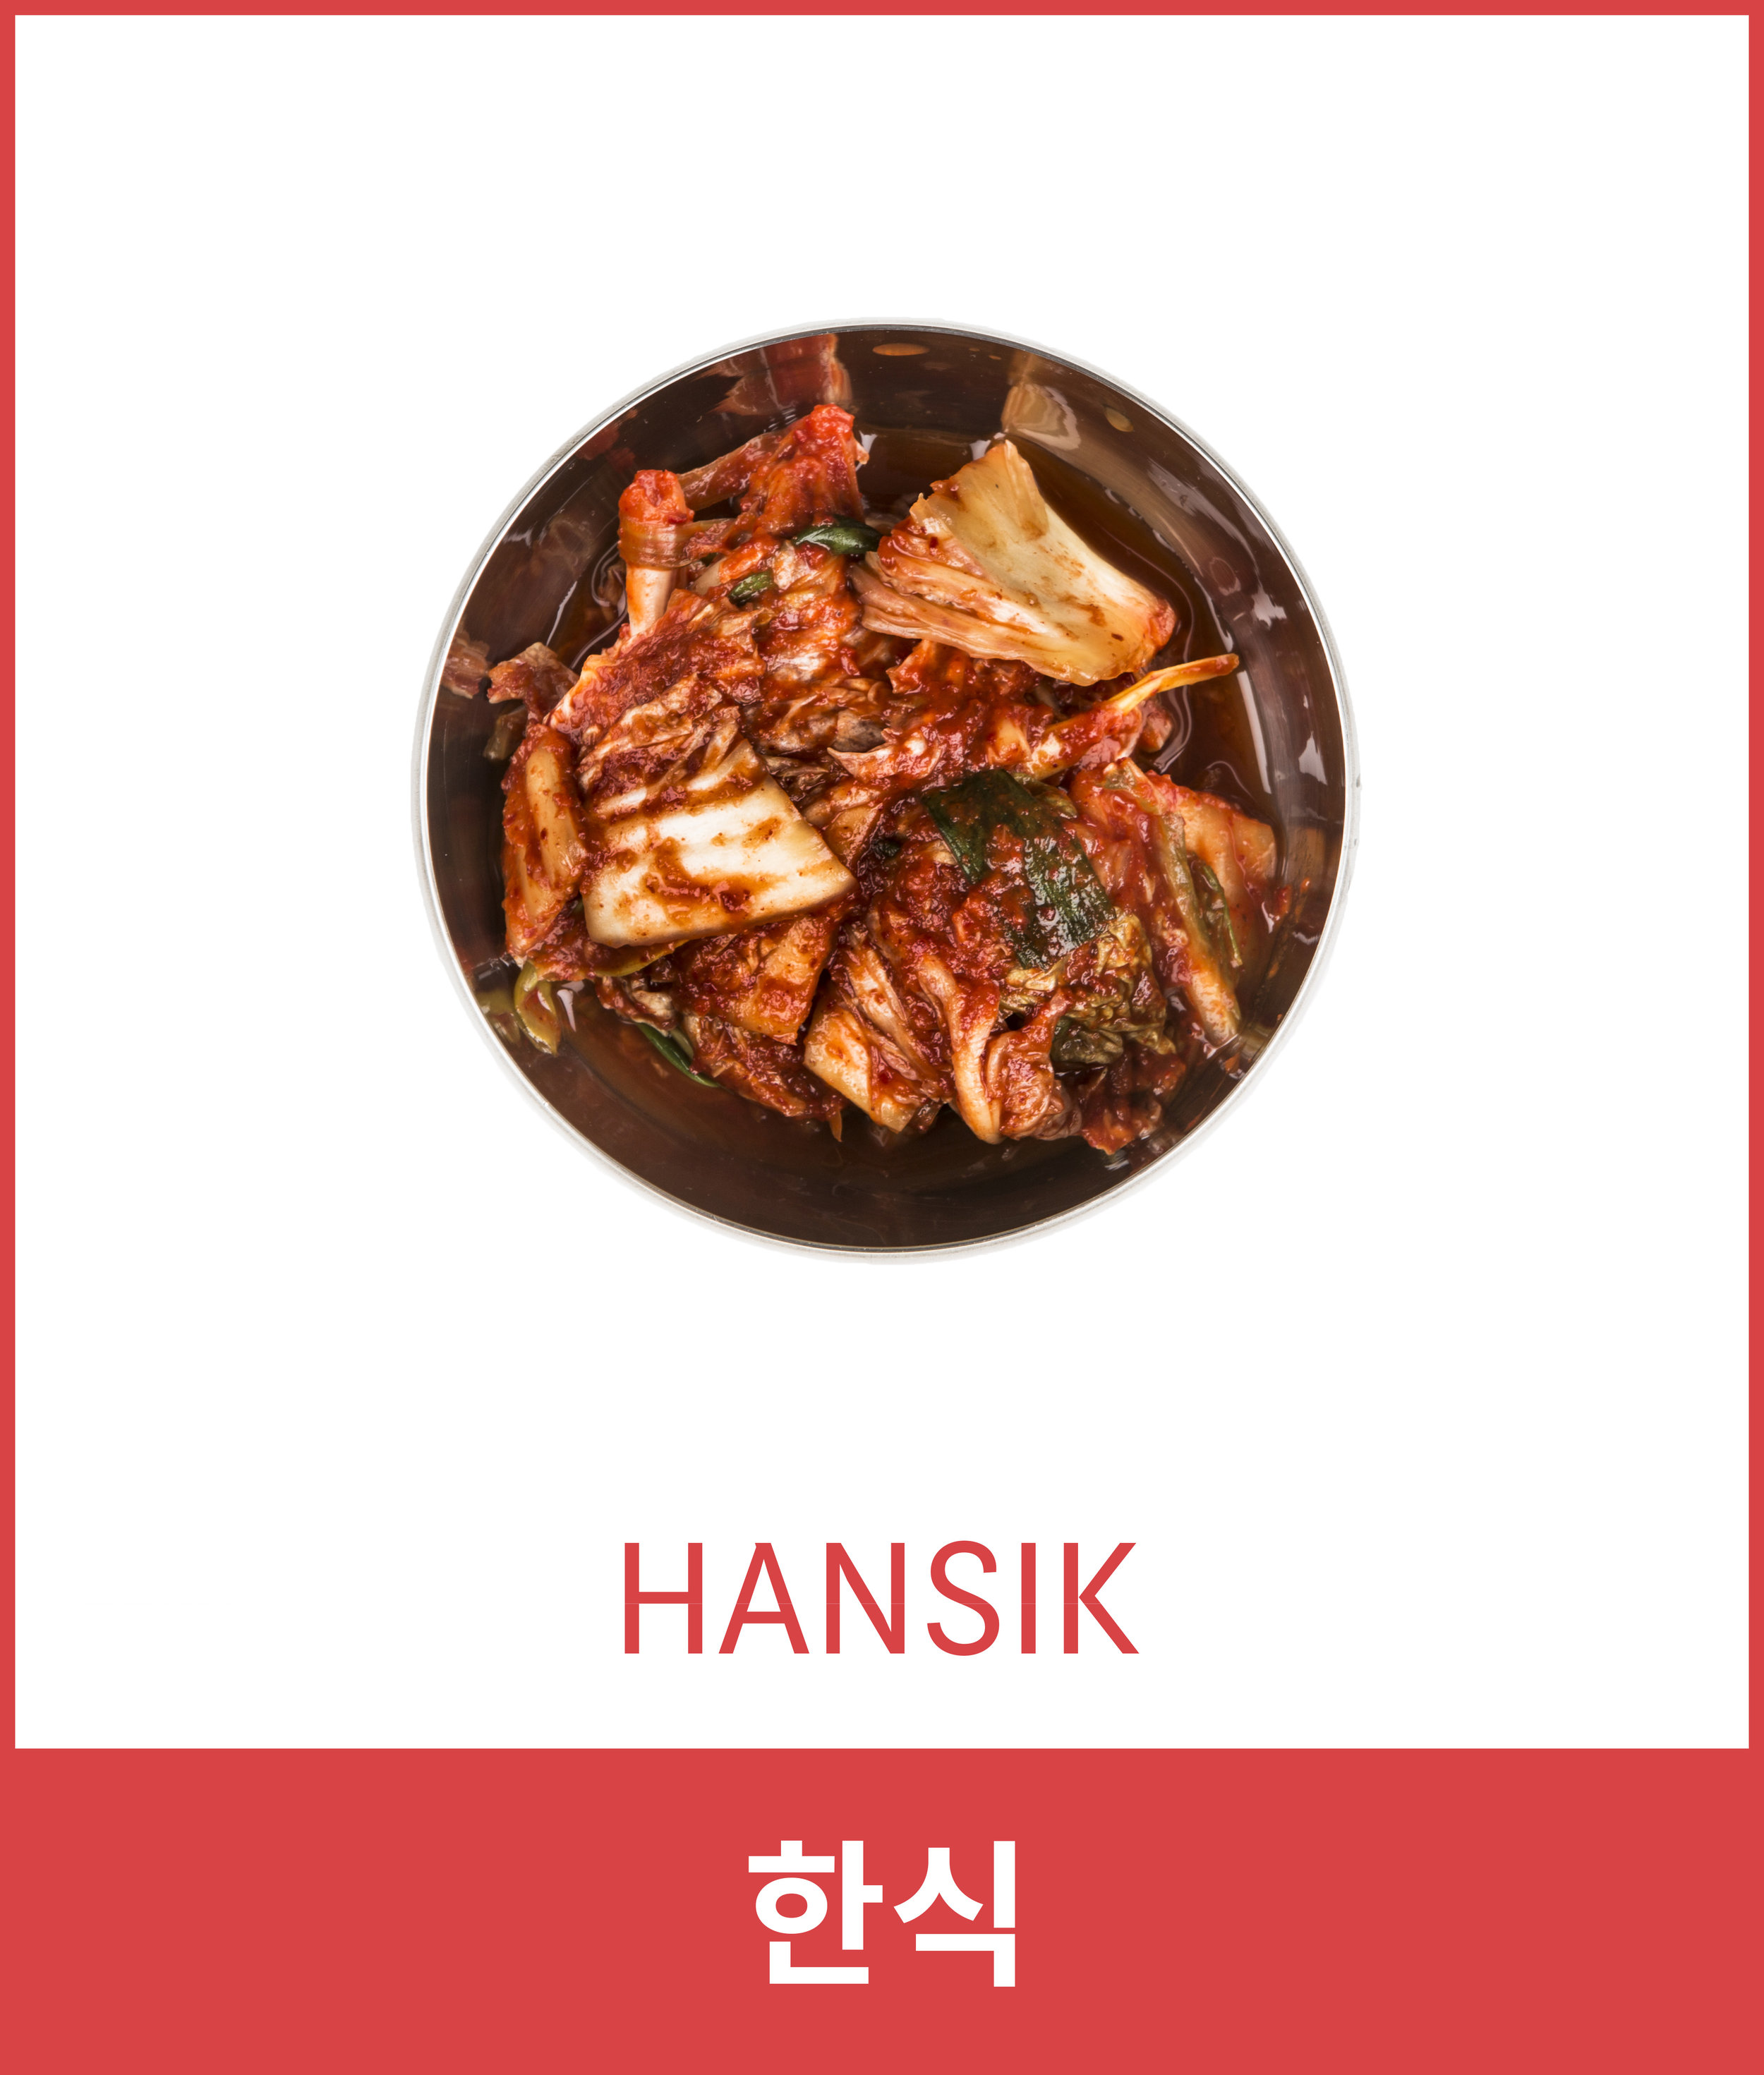 Hansik